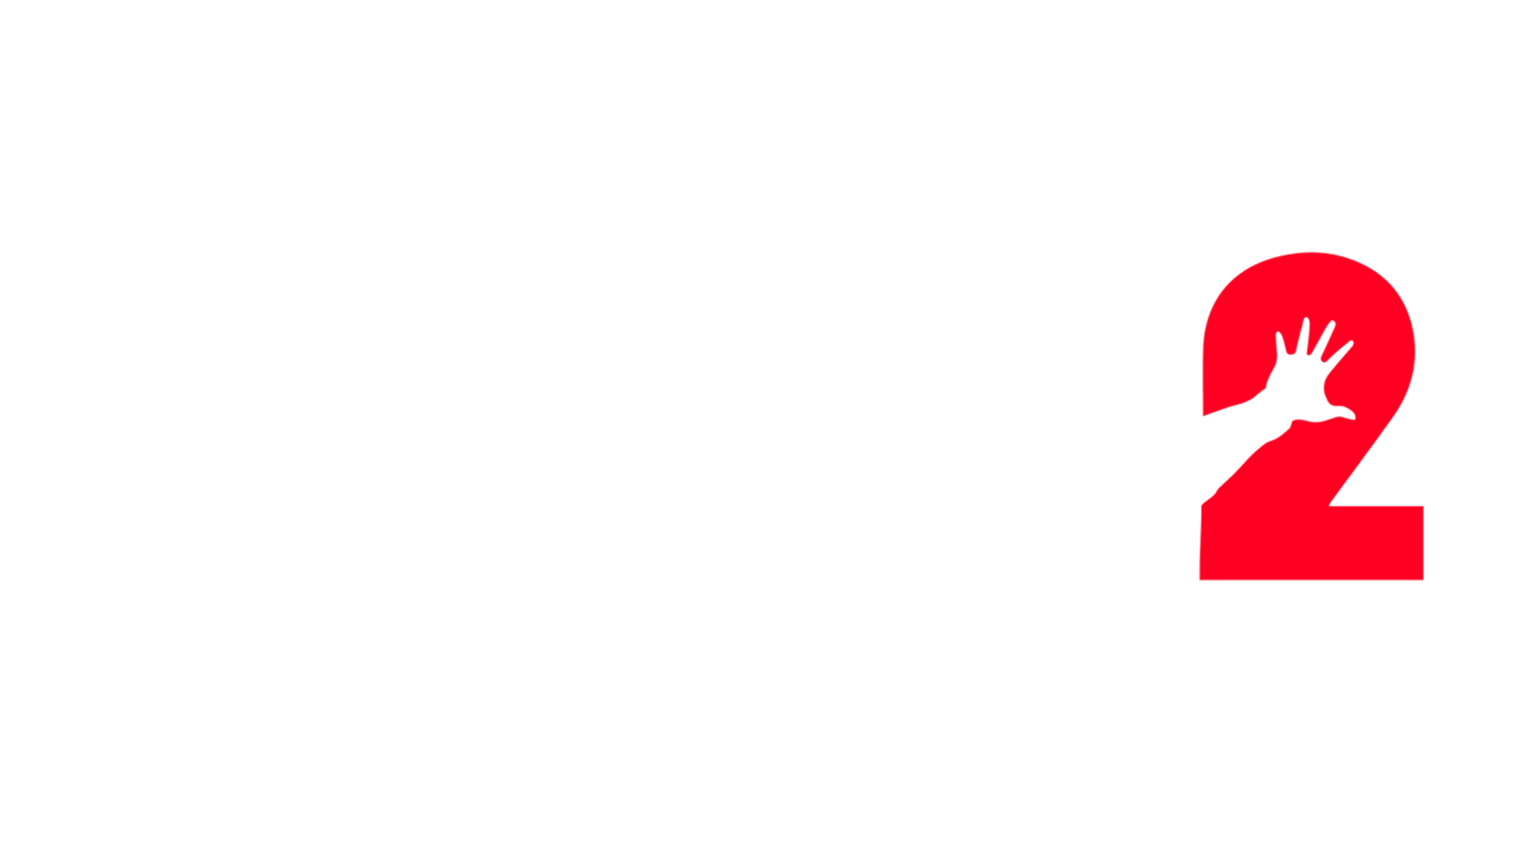 Q.U.B.E.2